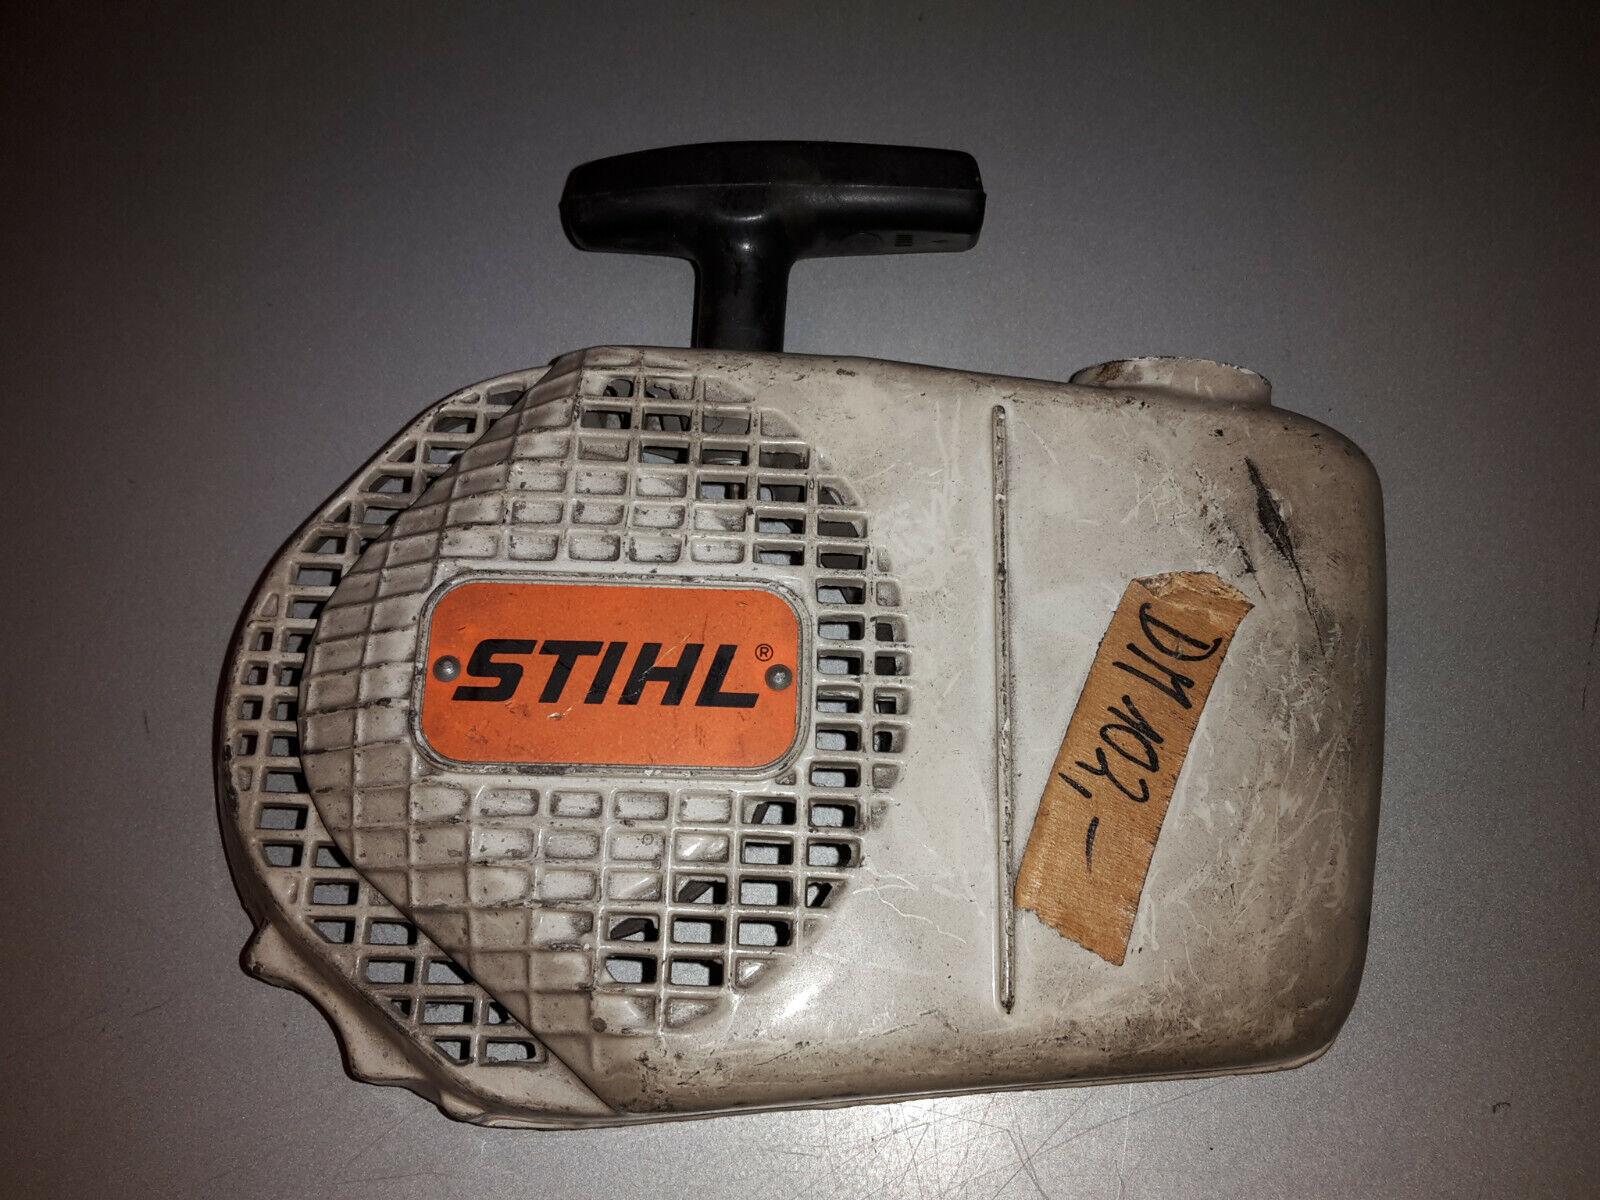 NEU Original Stihl 041 FS 20 FS 410 042AV 045  Reibungsschuh 1106 190 4600